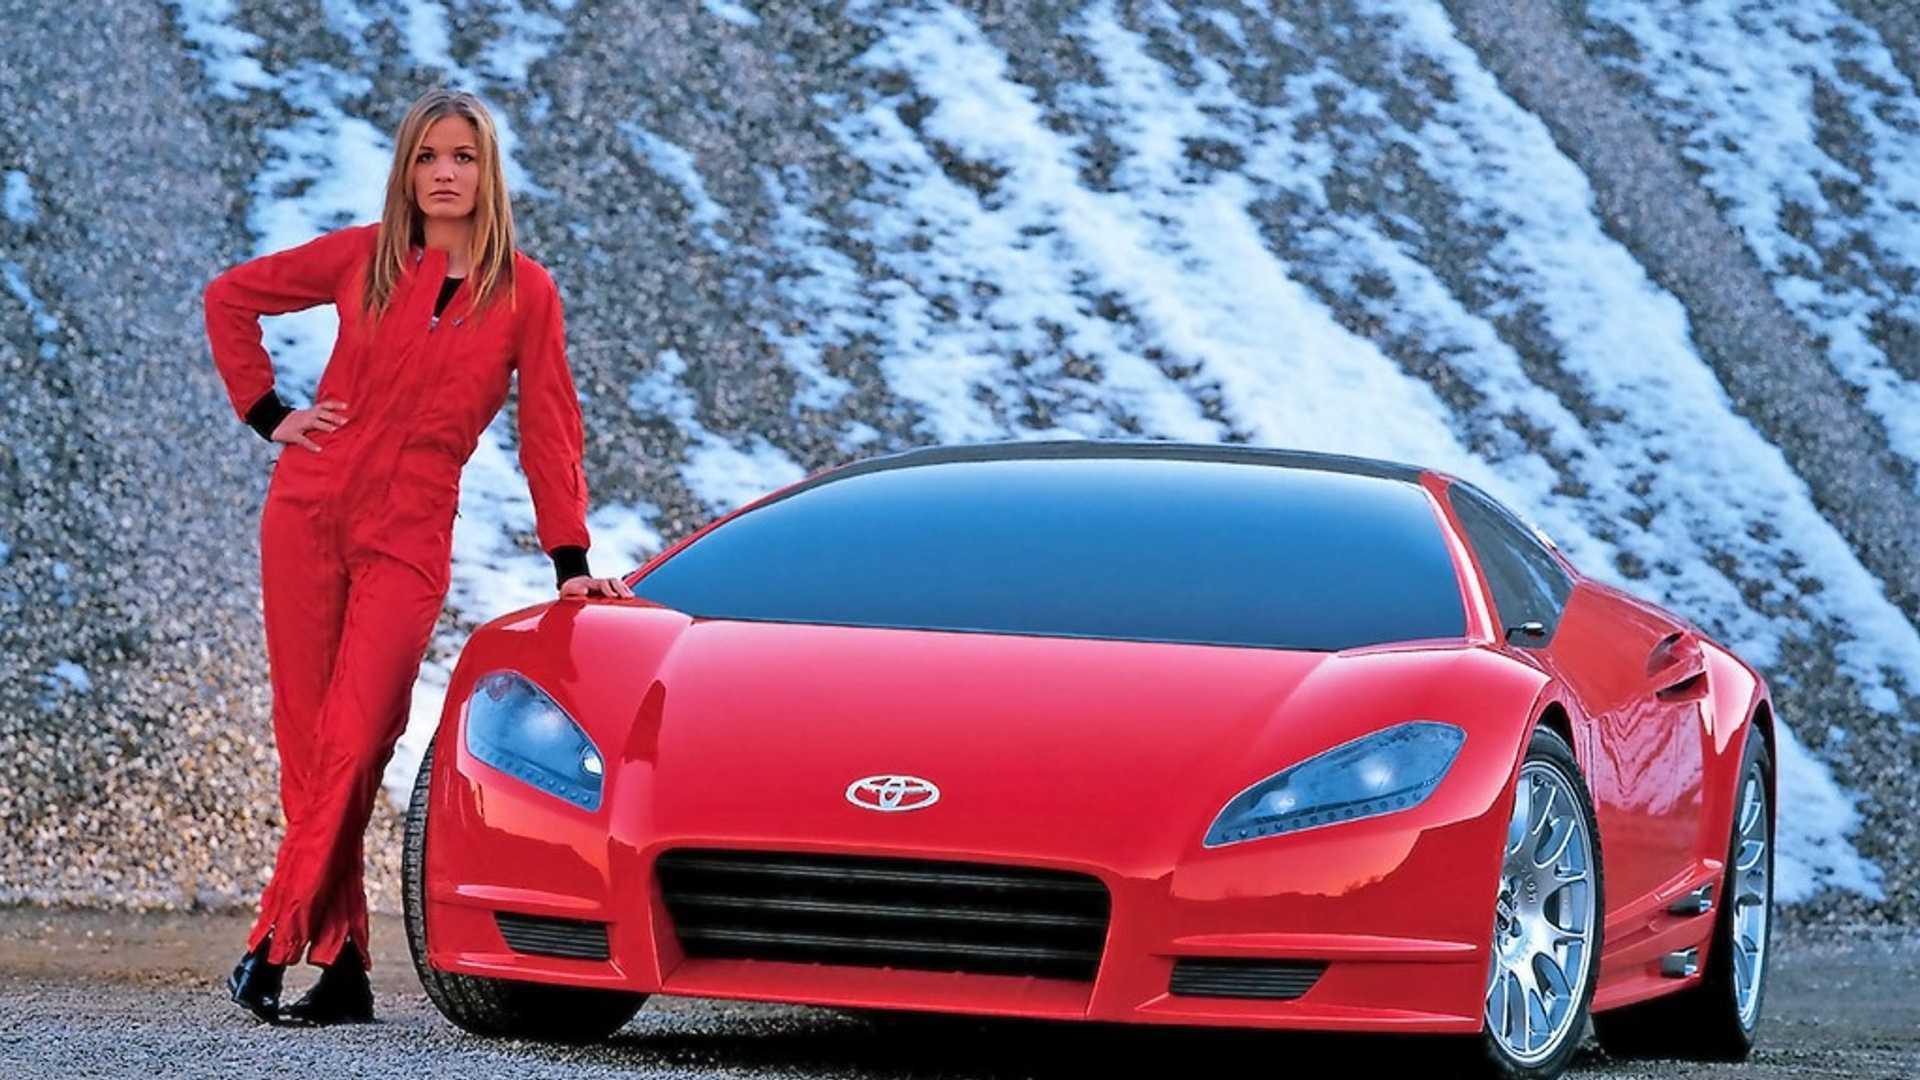 Toyota-Alessandro-Volta-concept-2004-3